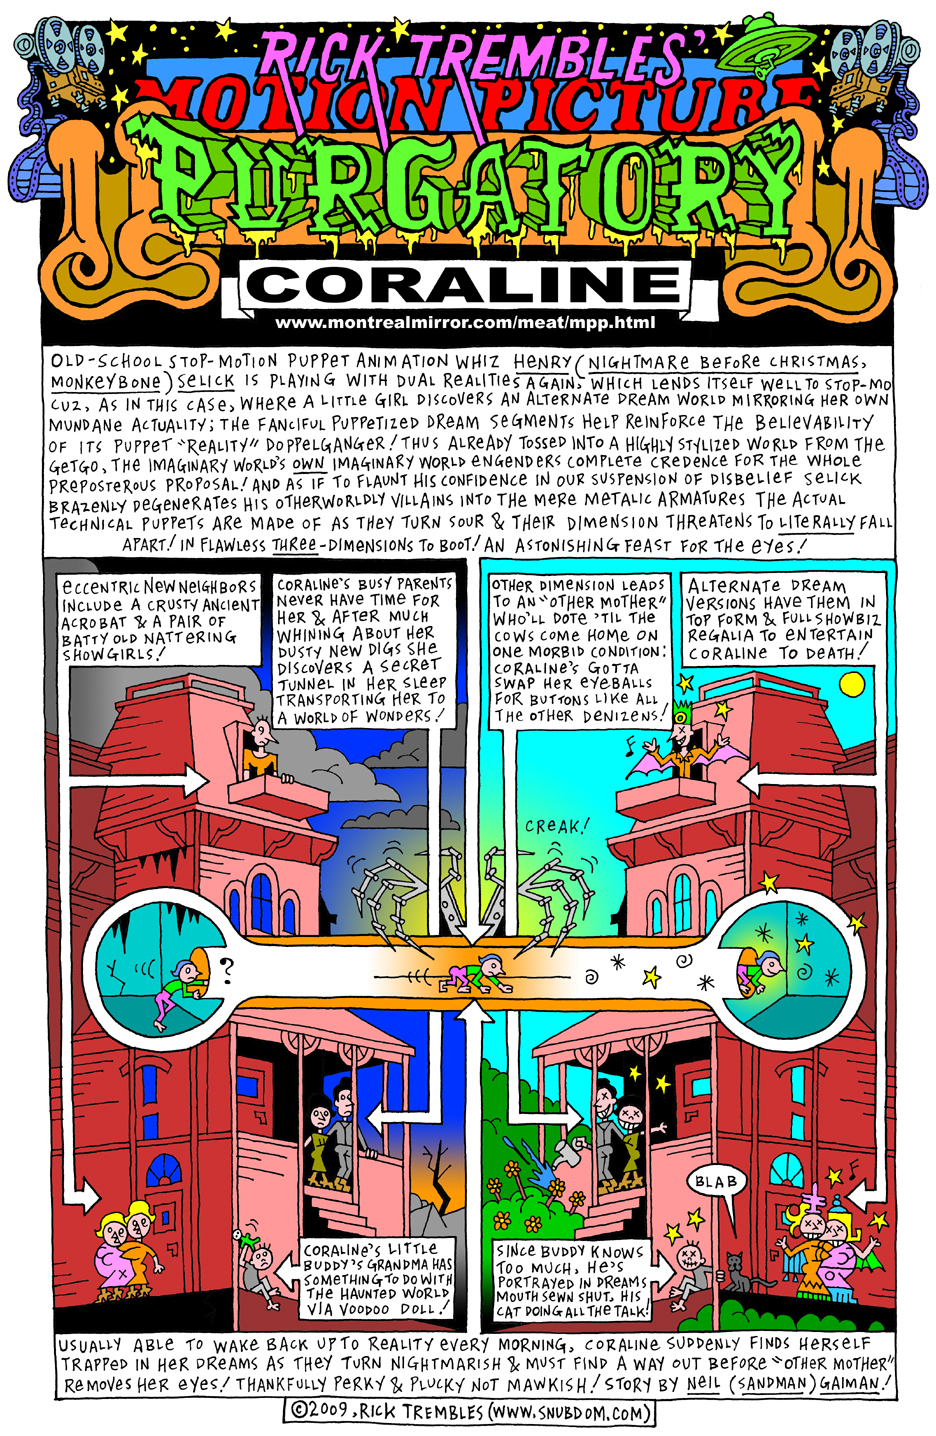 Motion Picture Purgatory Coraline 2009 Snubdom